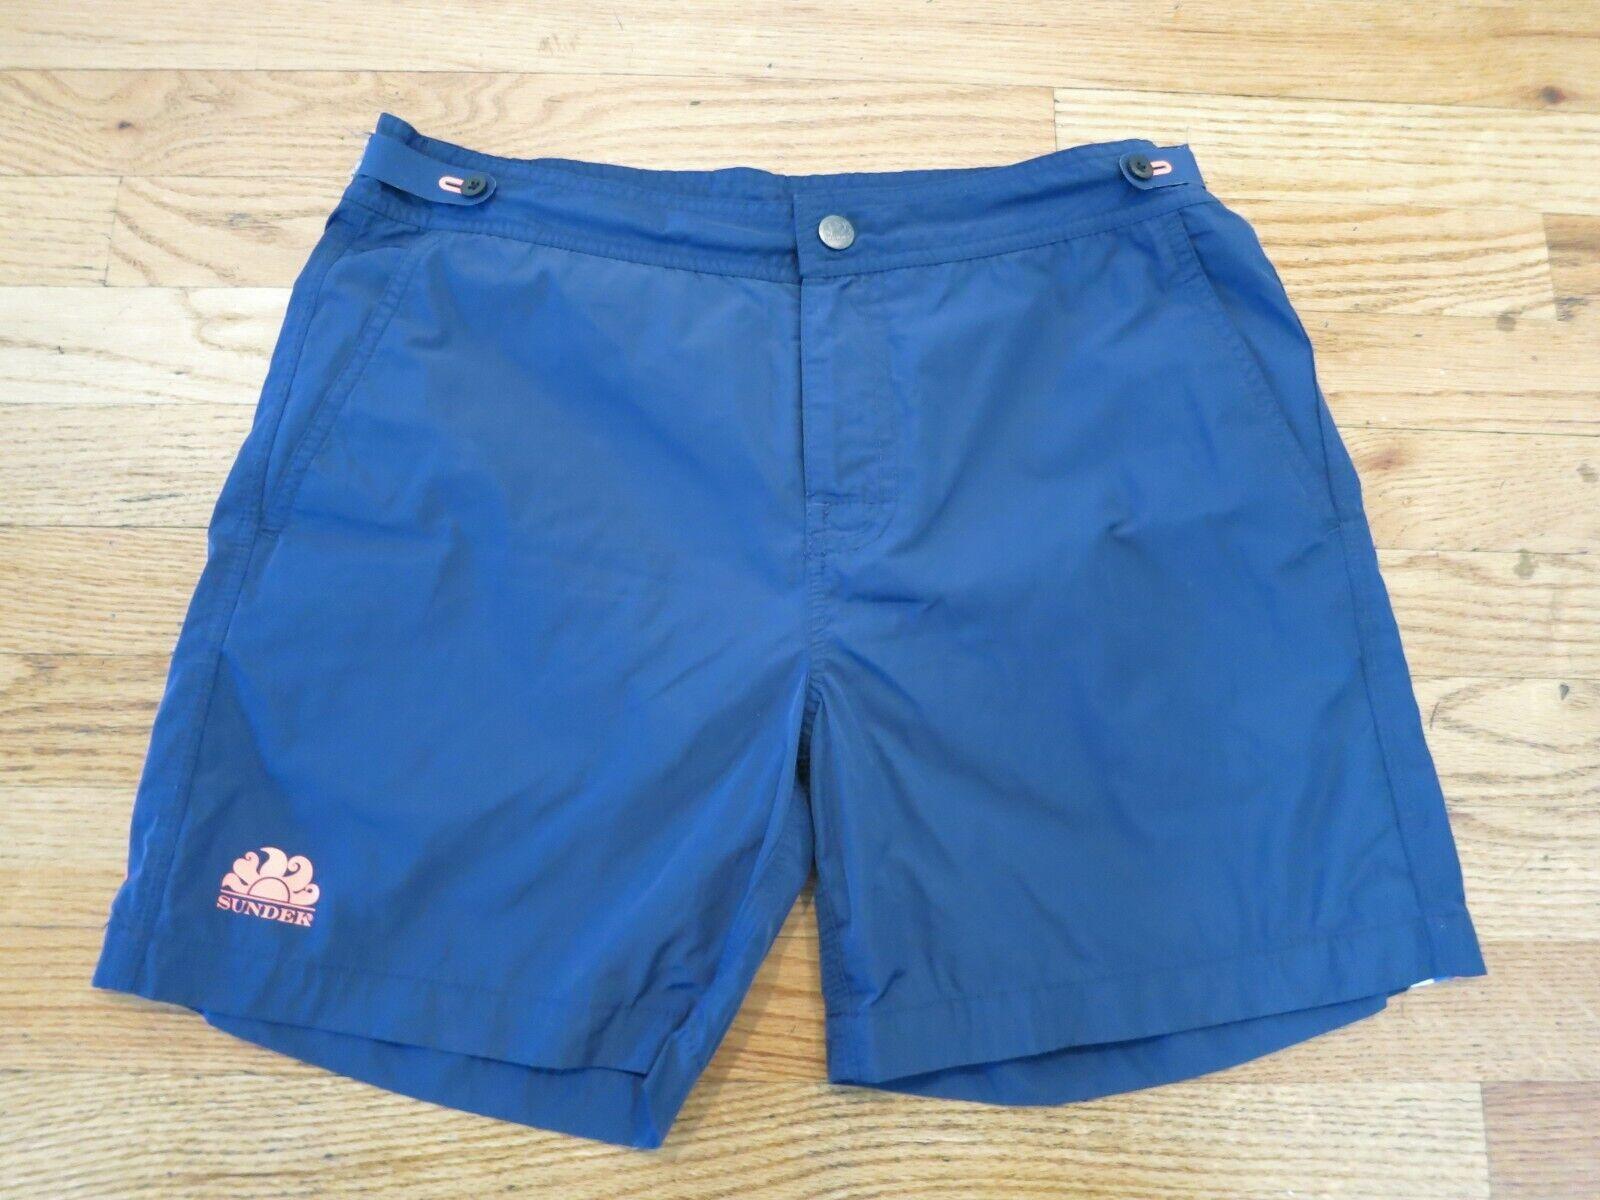 SUNDEK navy with orange and bluee rainbow waist 31